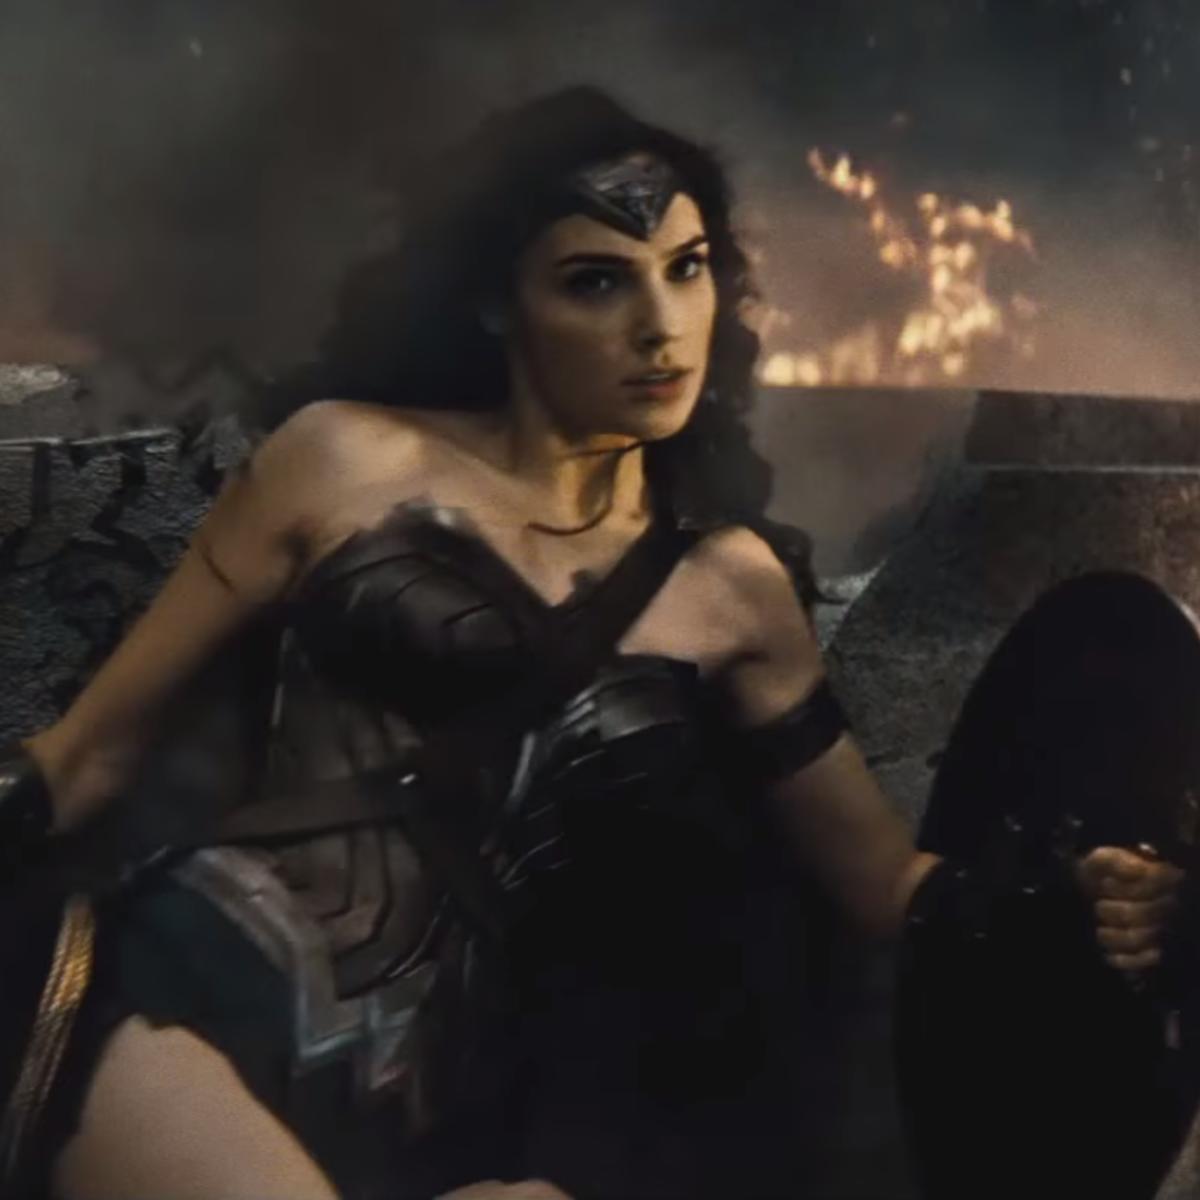 Wonder_Woman_Gal_Gadot_Batman-v-Superman-SDCC-trailer-1.png